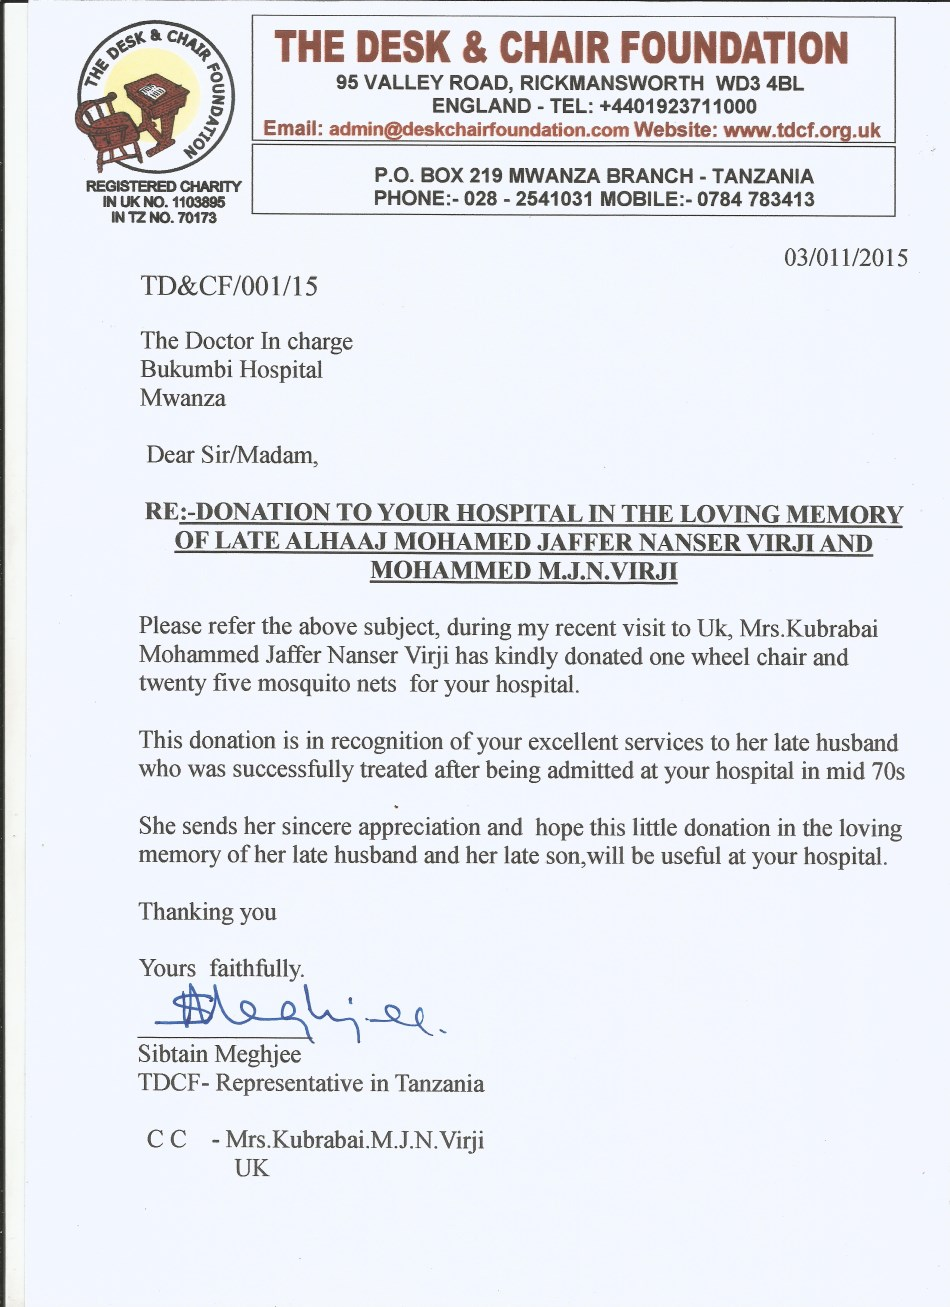 Bukumbi Hospital Donation